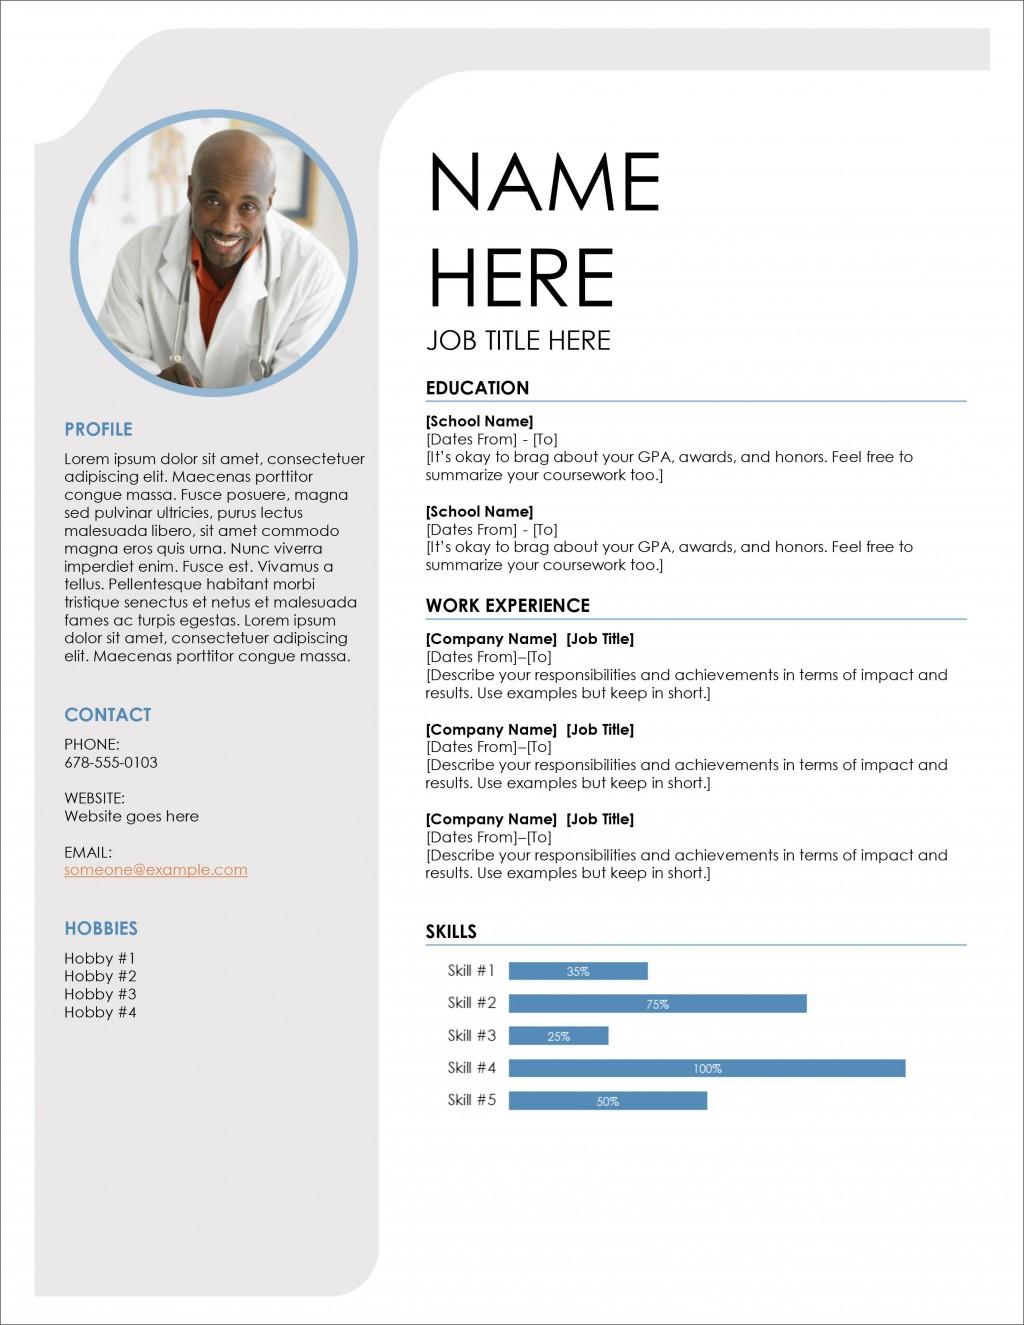 002 Best Resume Template Word 2003 Free Download Idea  DownloadsLarge